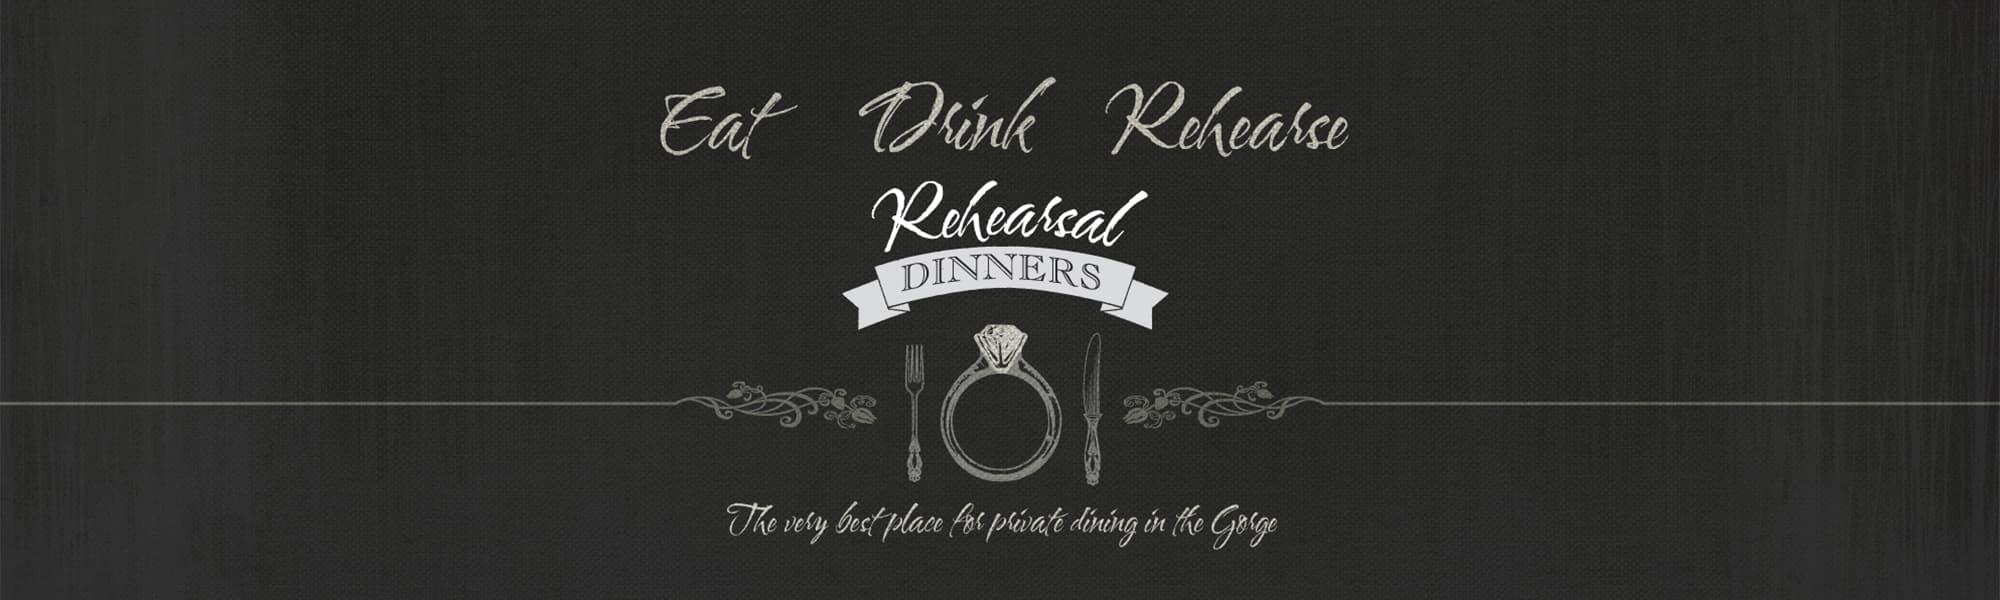 Eat Drink Rehears